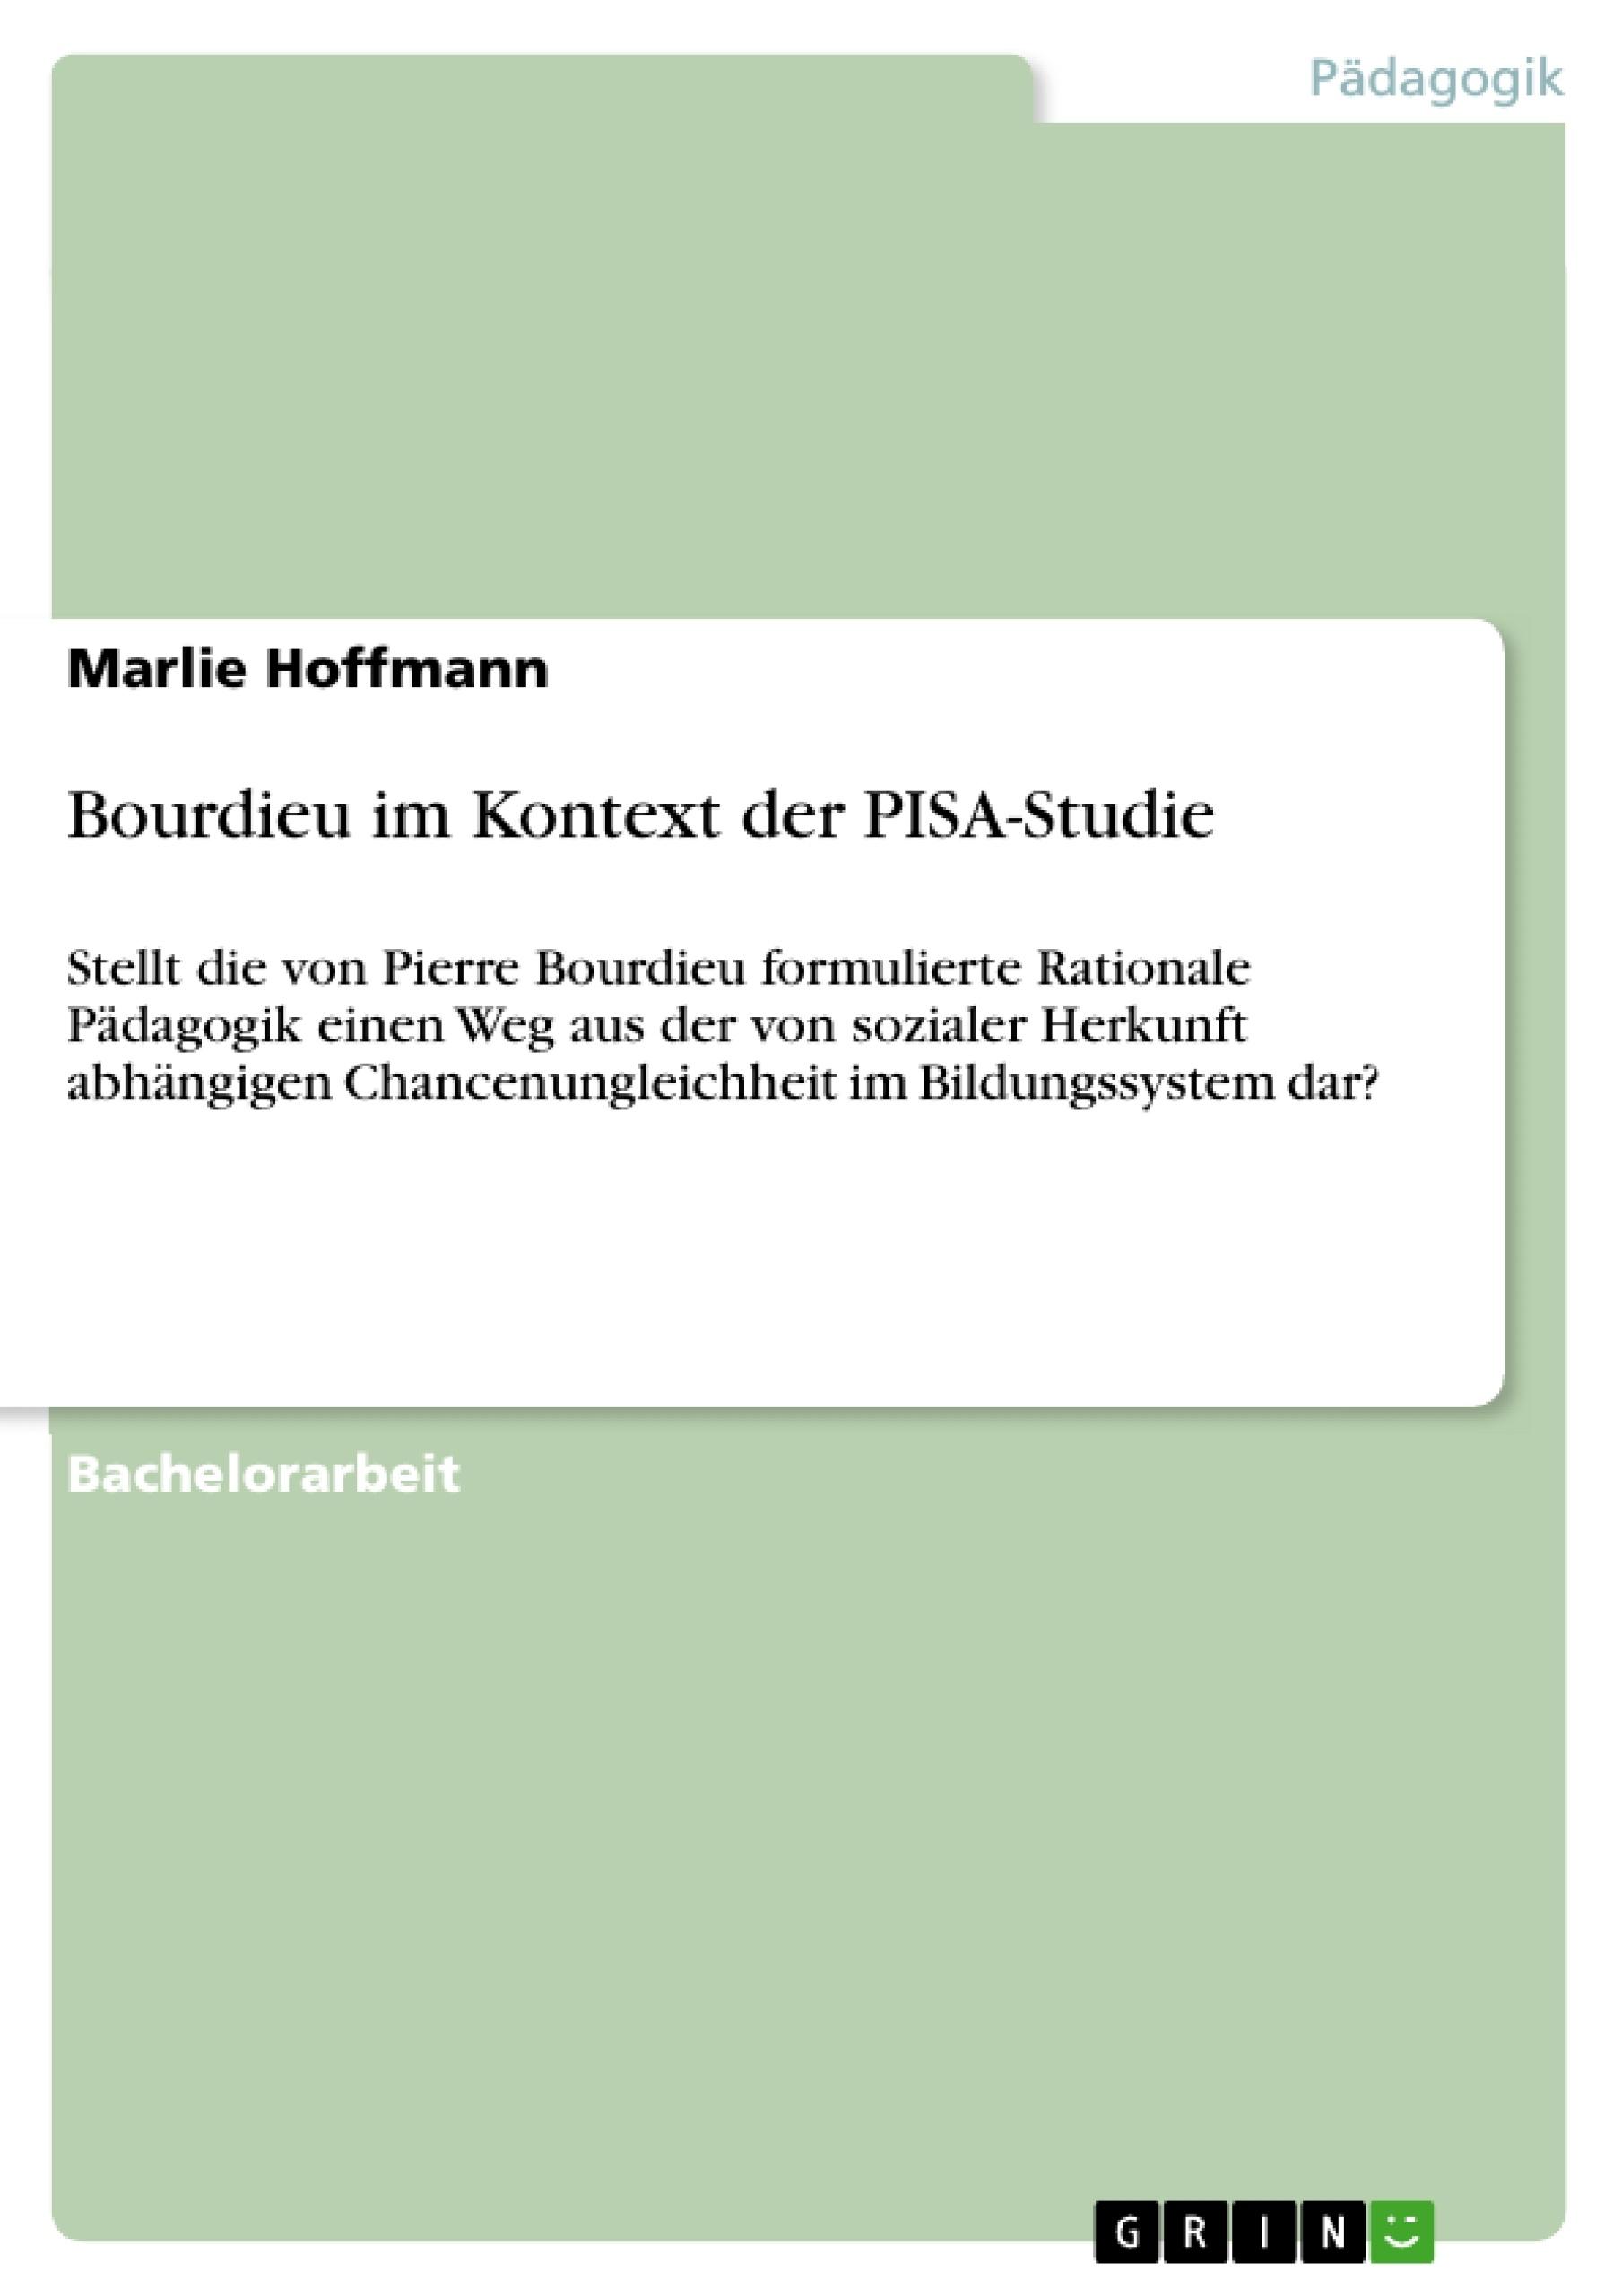 Titel: Bourdieu im Kontext der PISA-Studie